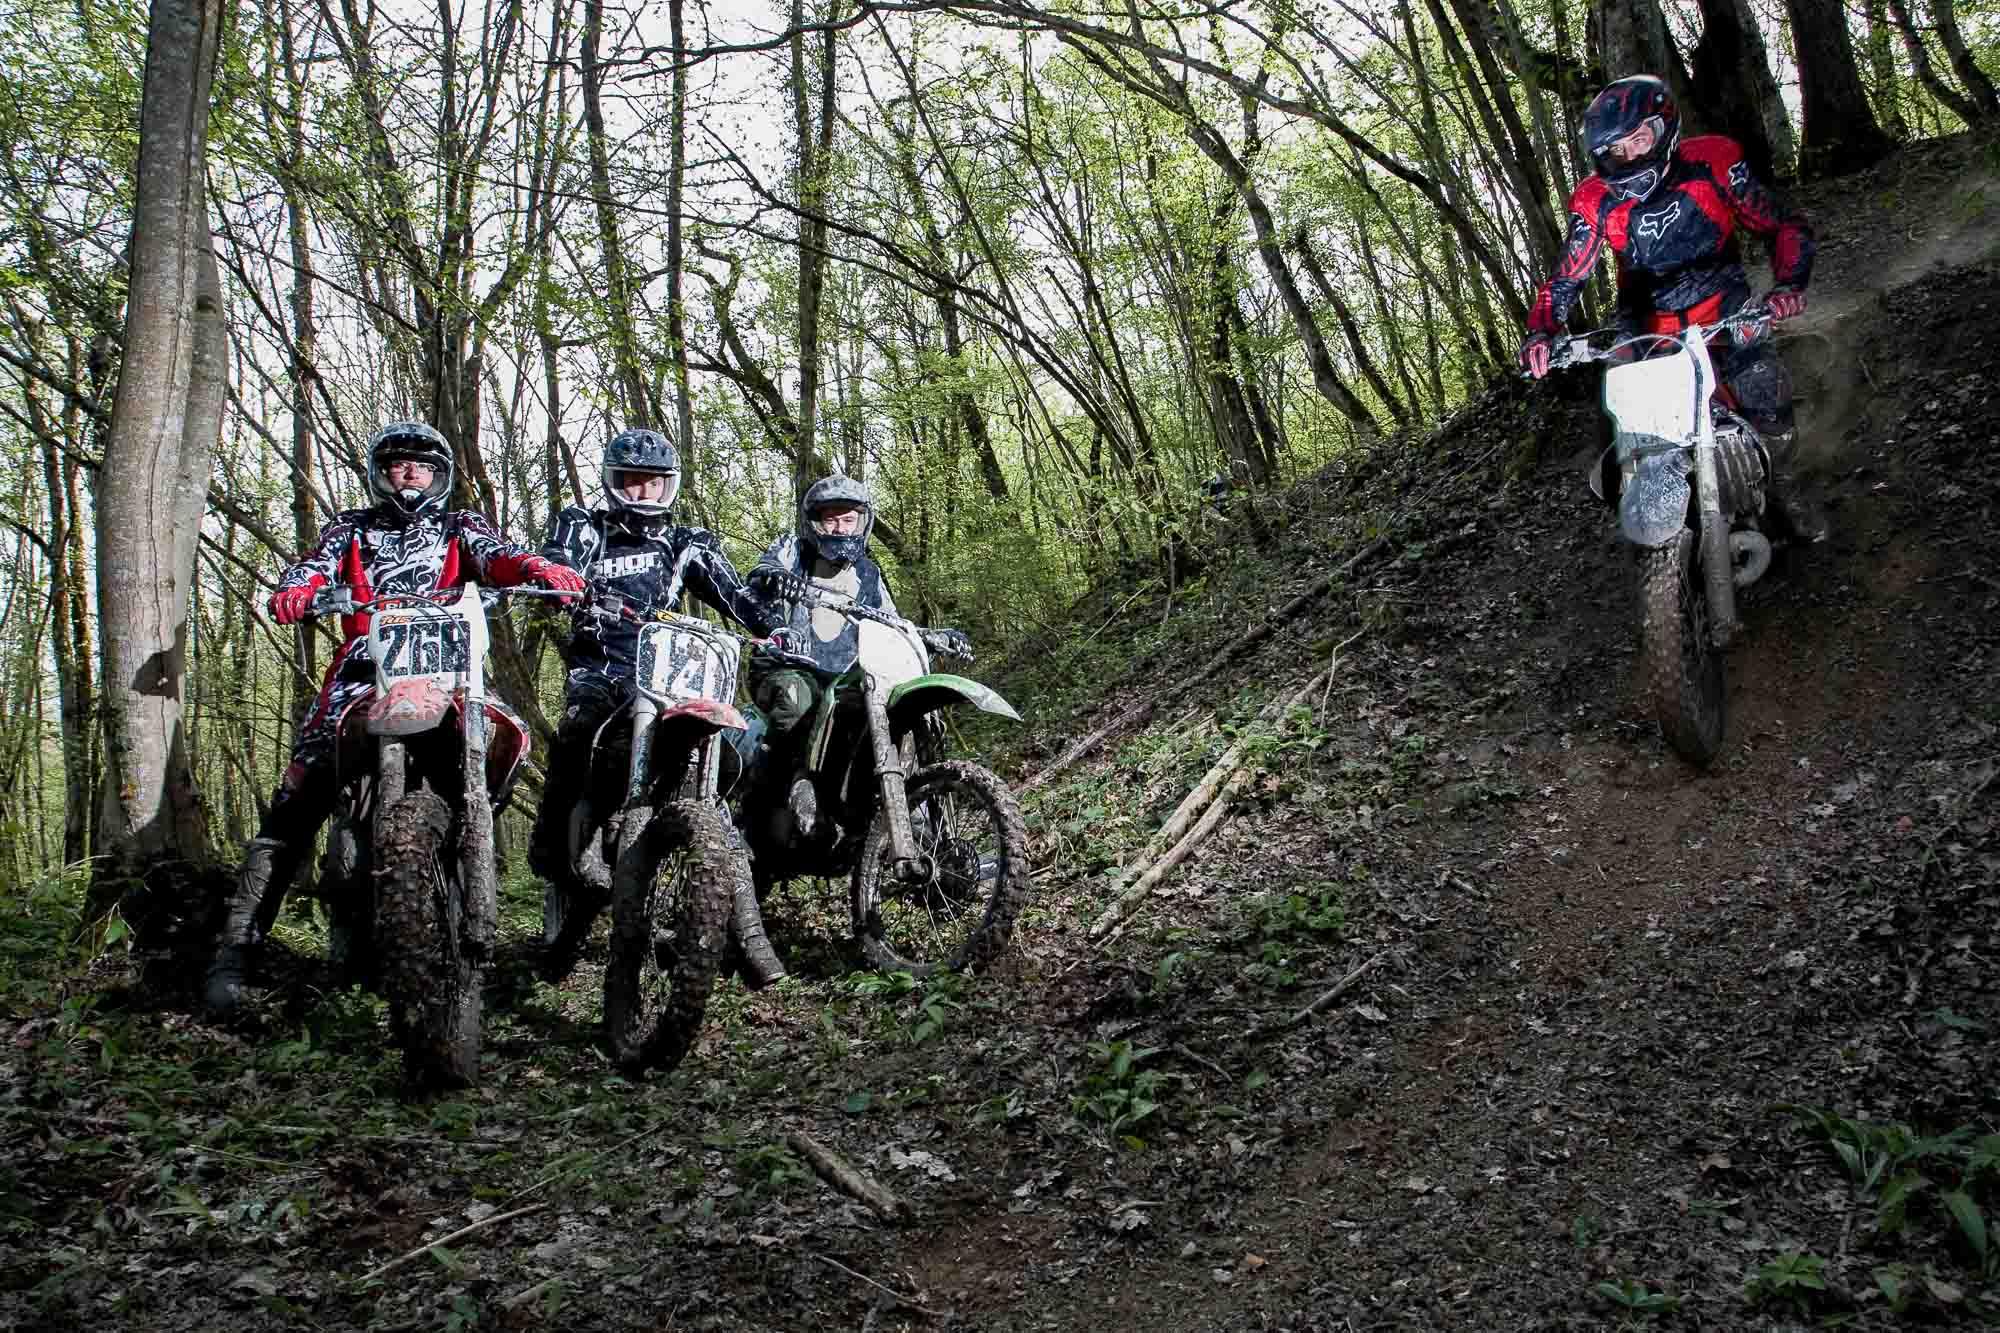 20100425-motos yvoire-36.jpg